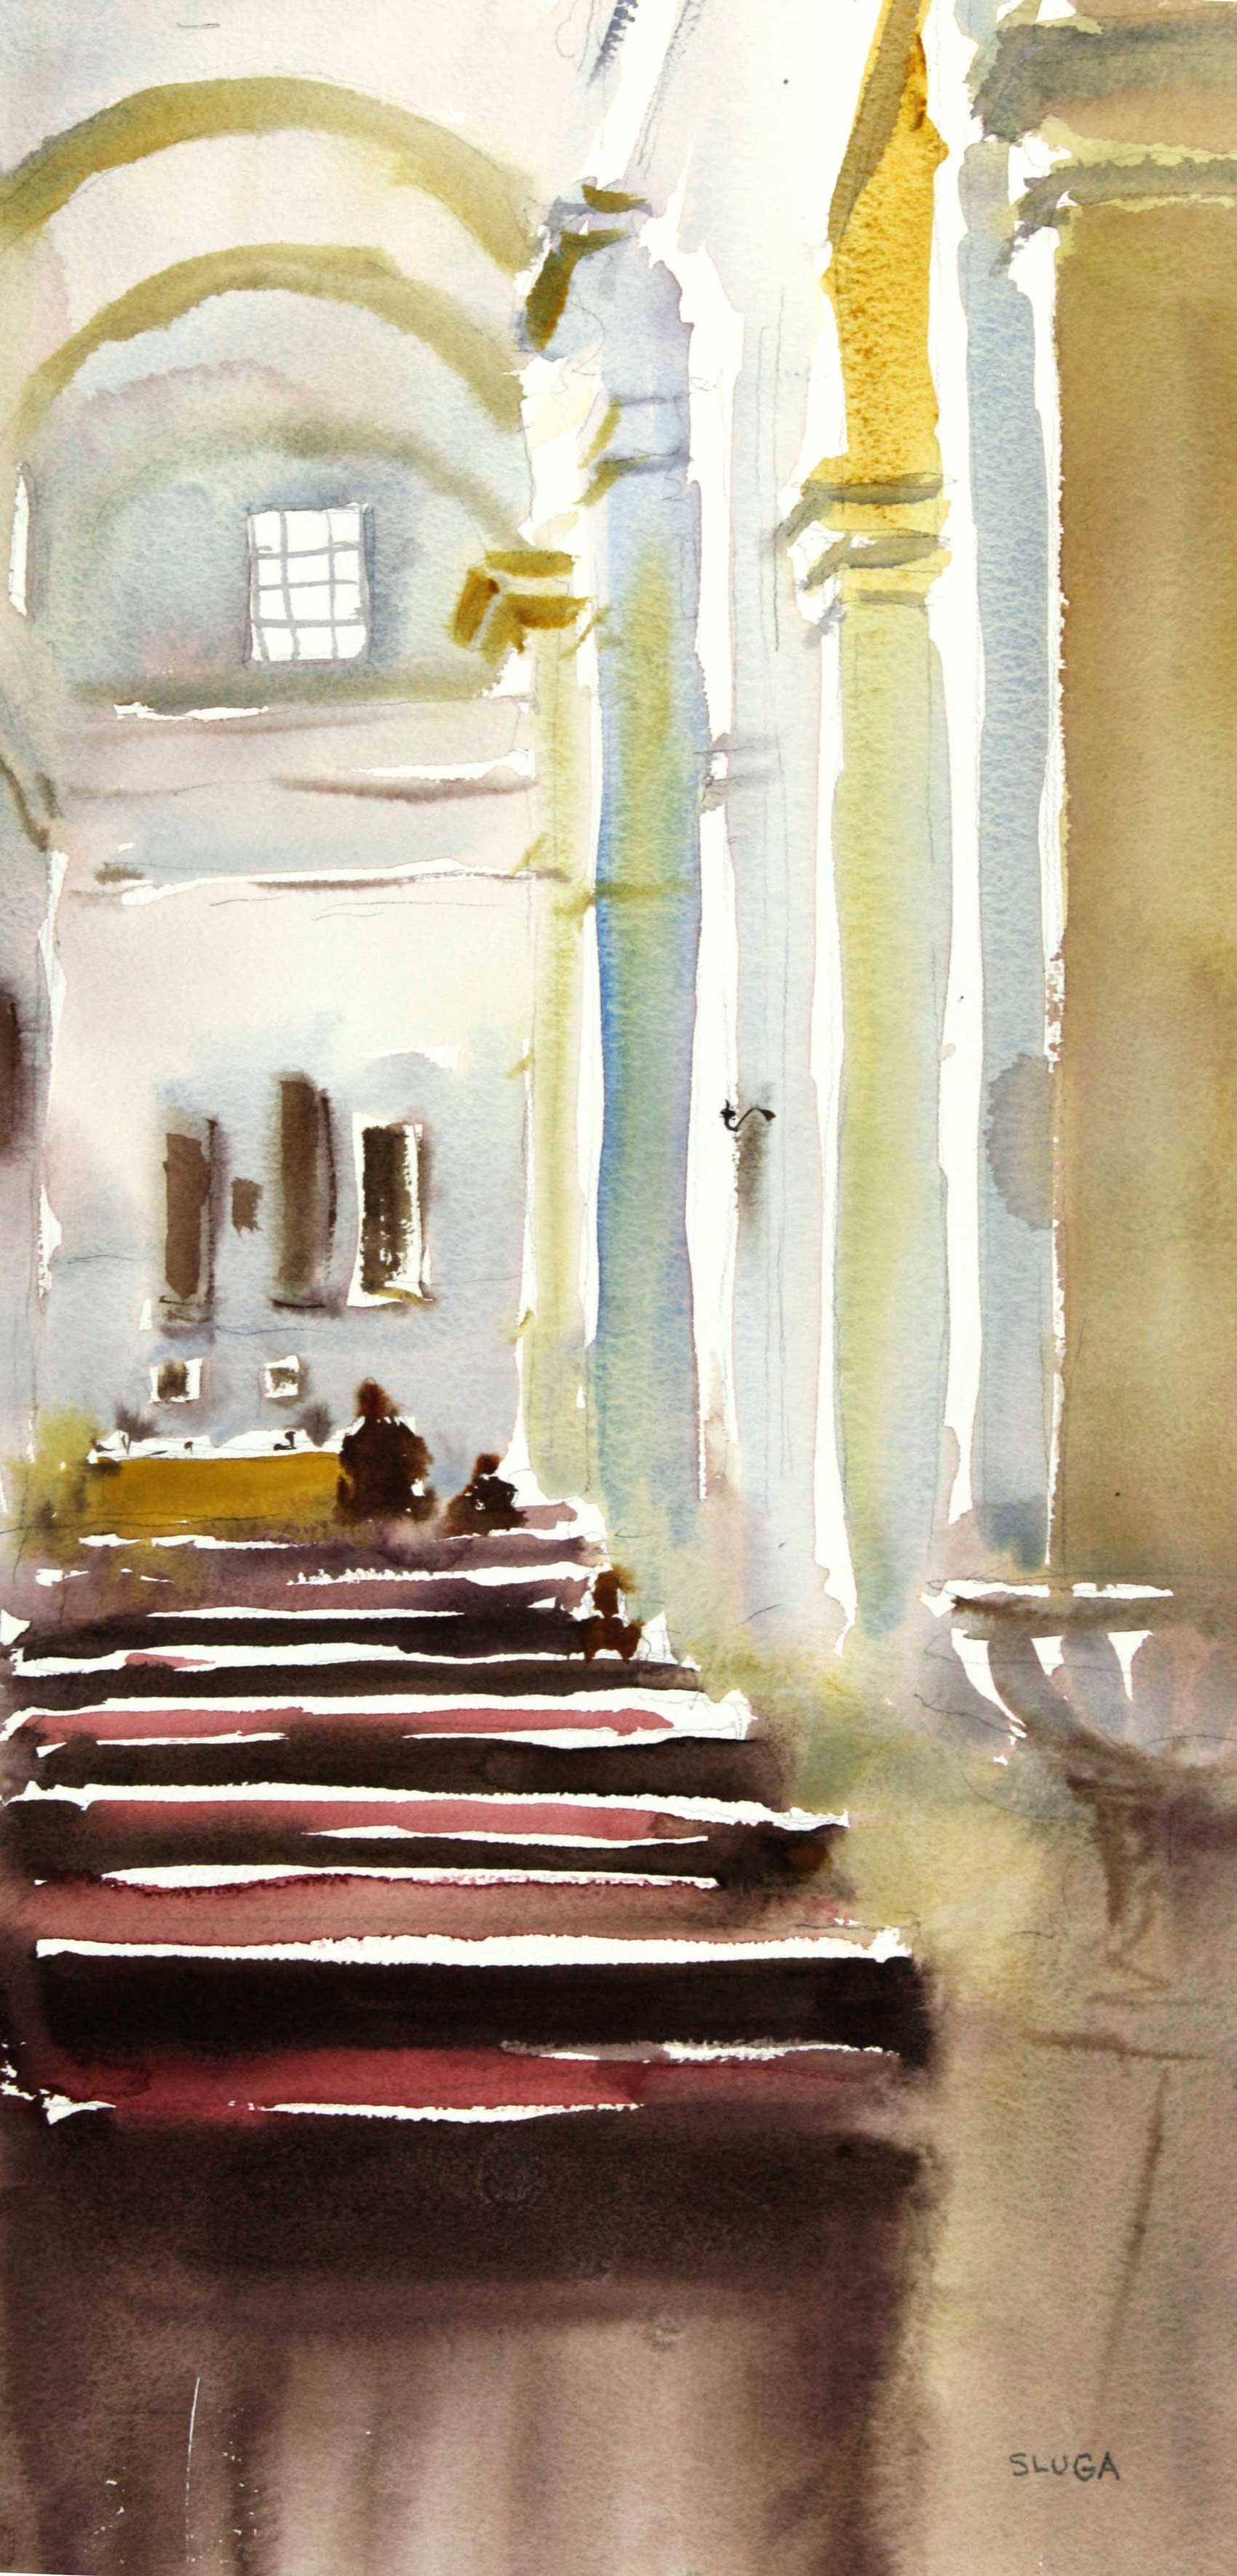 Sunday Church 28 x 55 cm